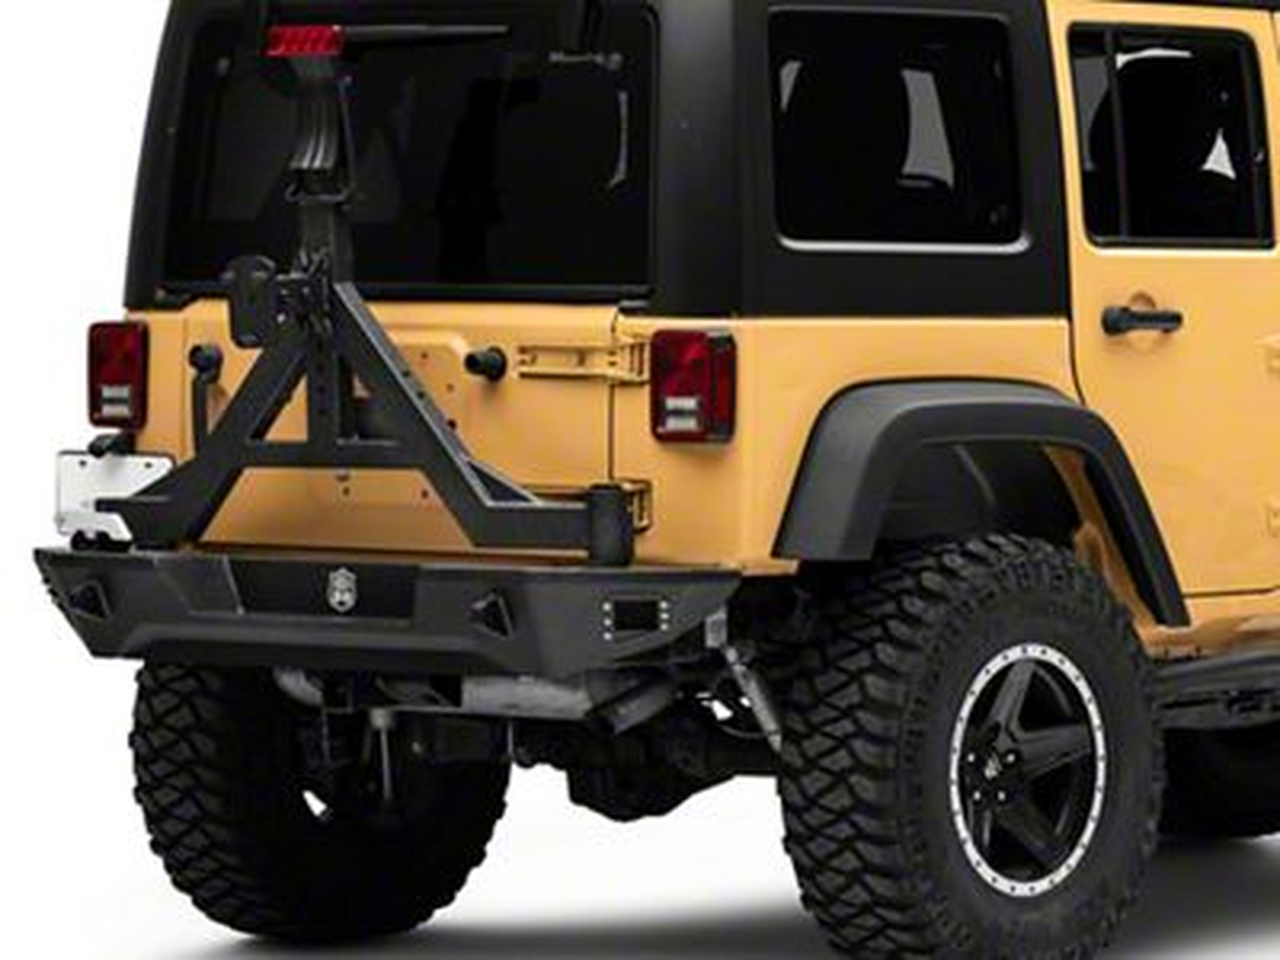 Deegan 38 Rear Bumper w/ Tire Carrier (07-18 Jeep Wrangler JK)